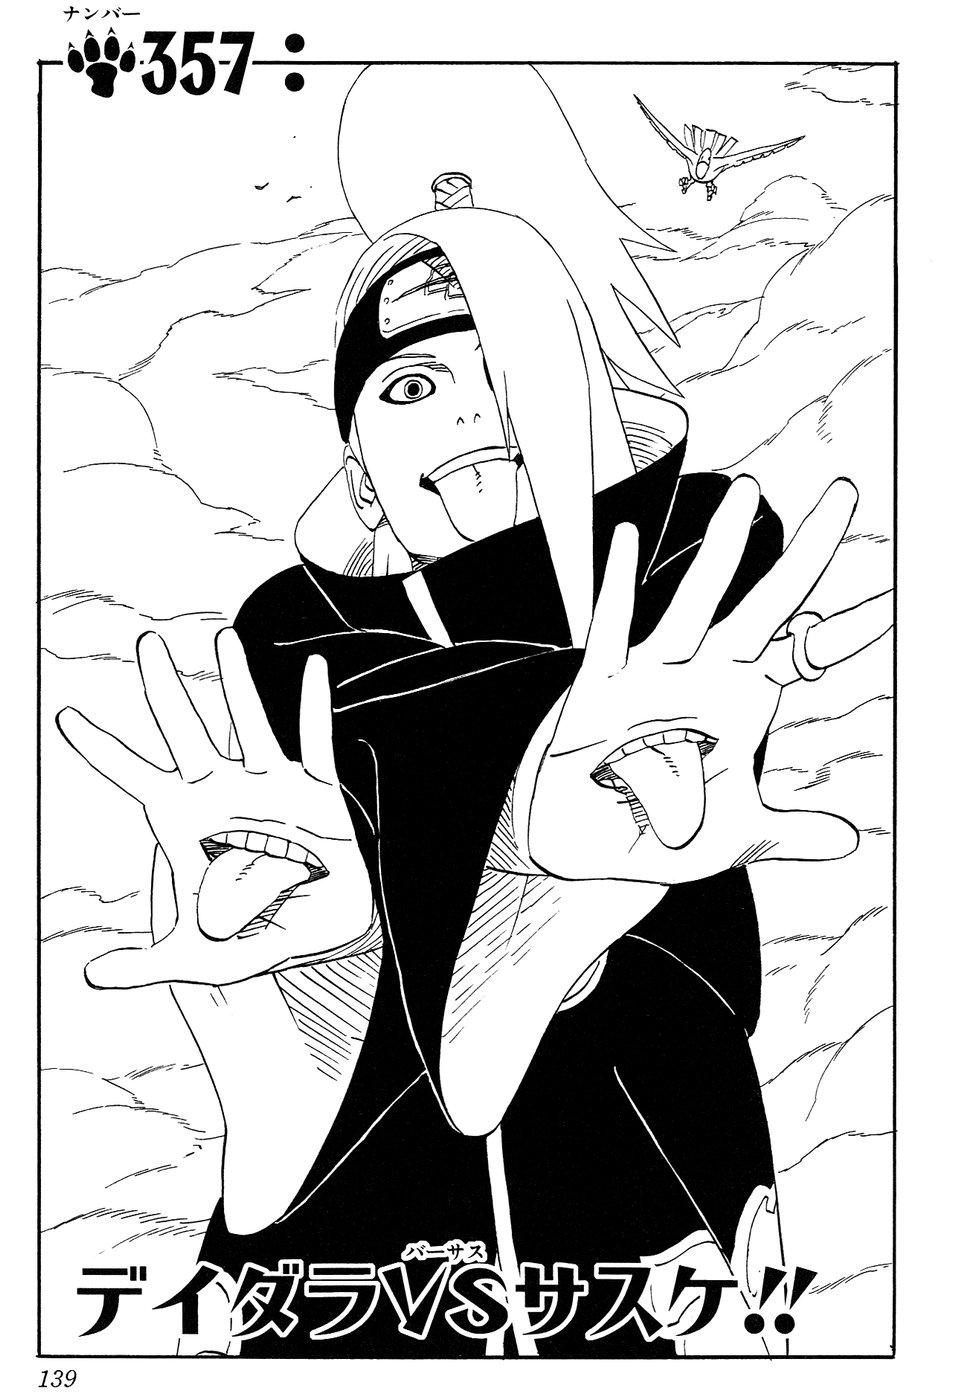 Deidara vs. Sasuke!! | Narutopedia | Fandom powered by Wikia